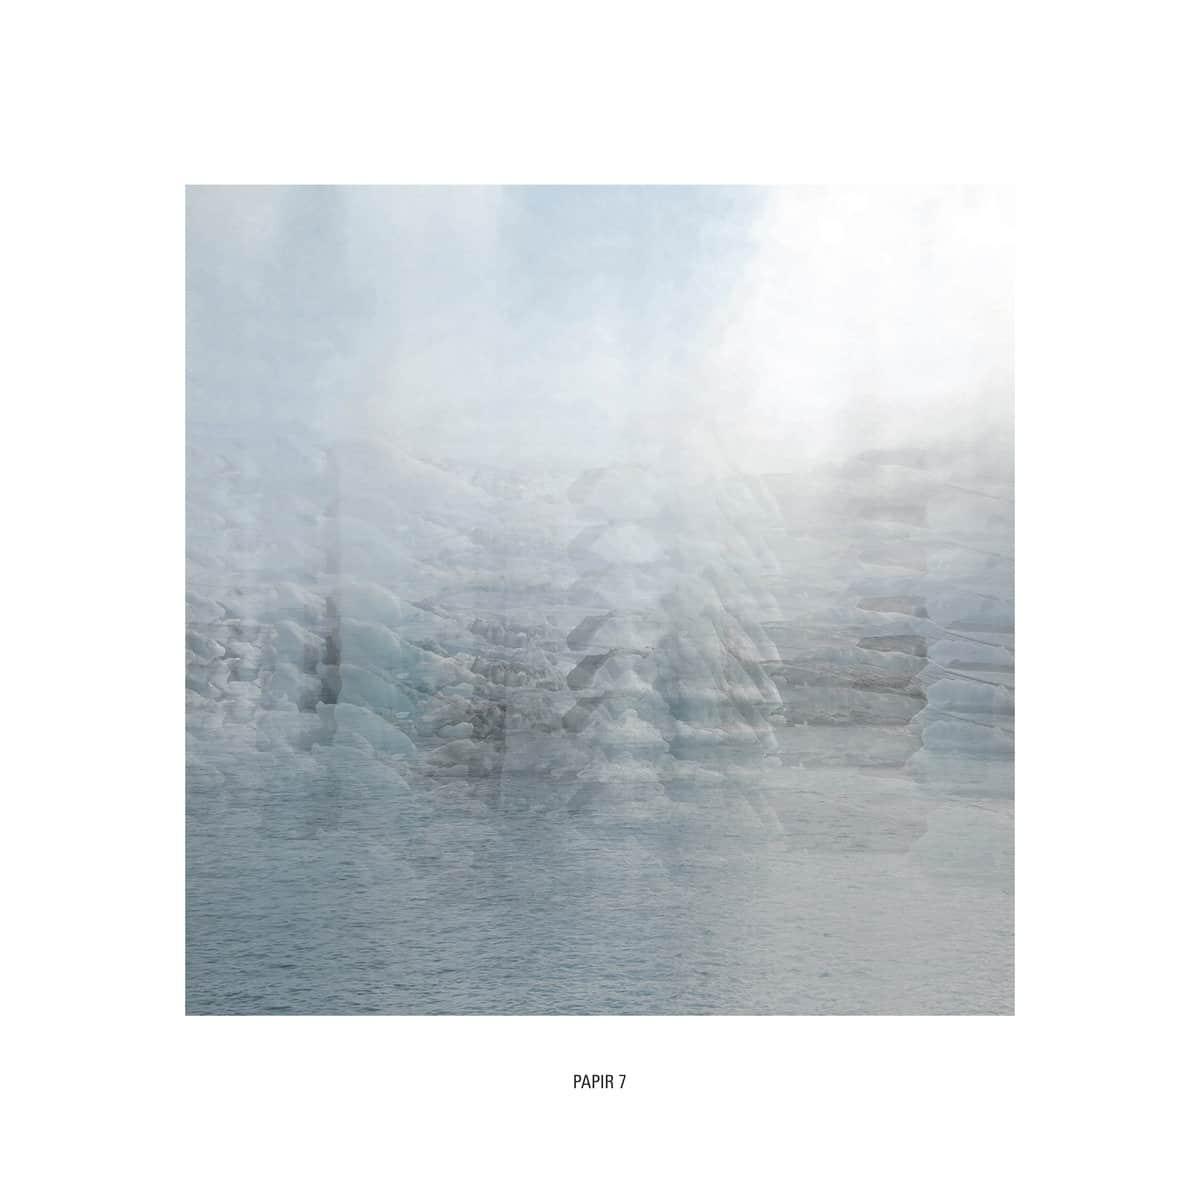 "papir:-neues-psychedelic-krautrock-album-""7""-im-januar-2022"